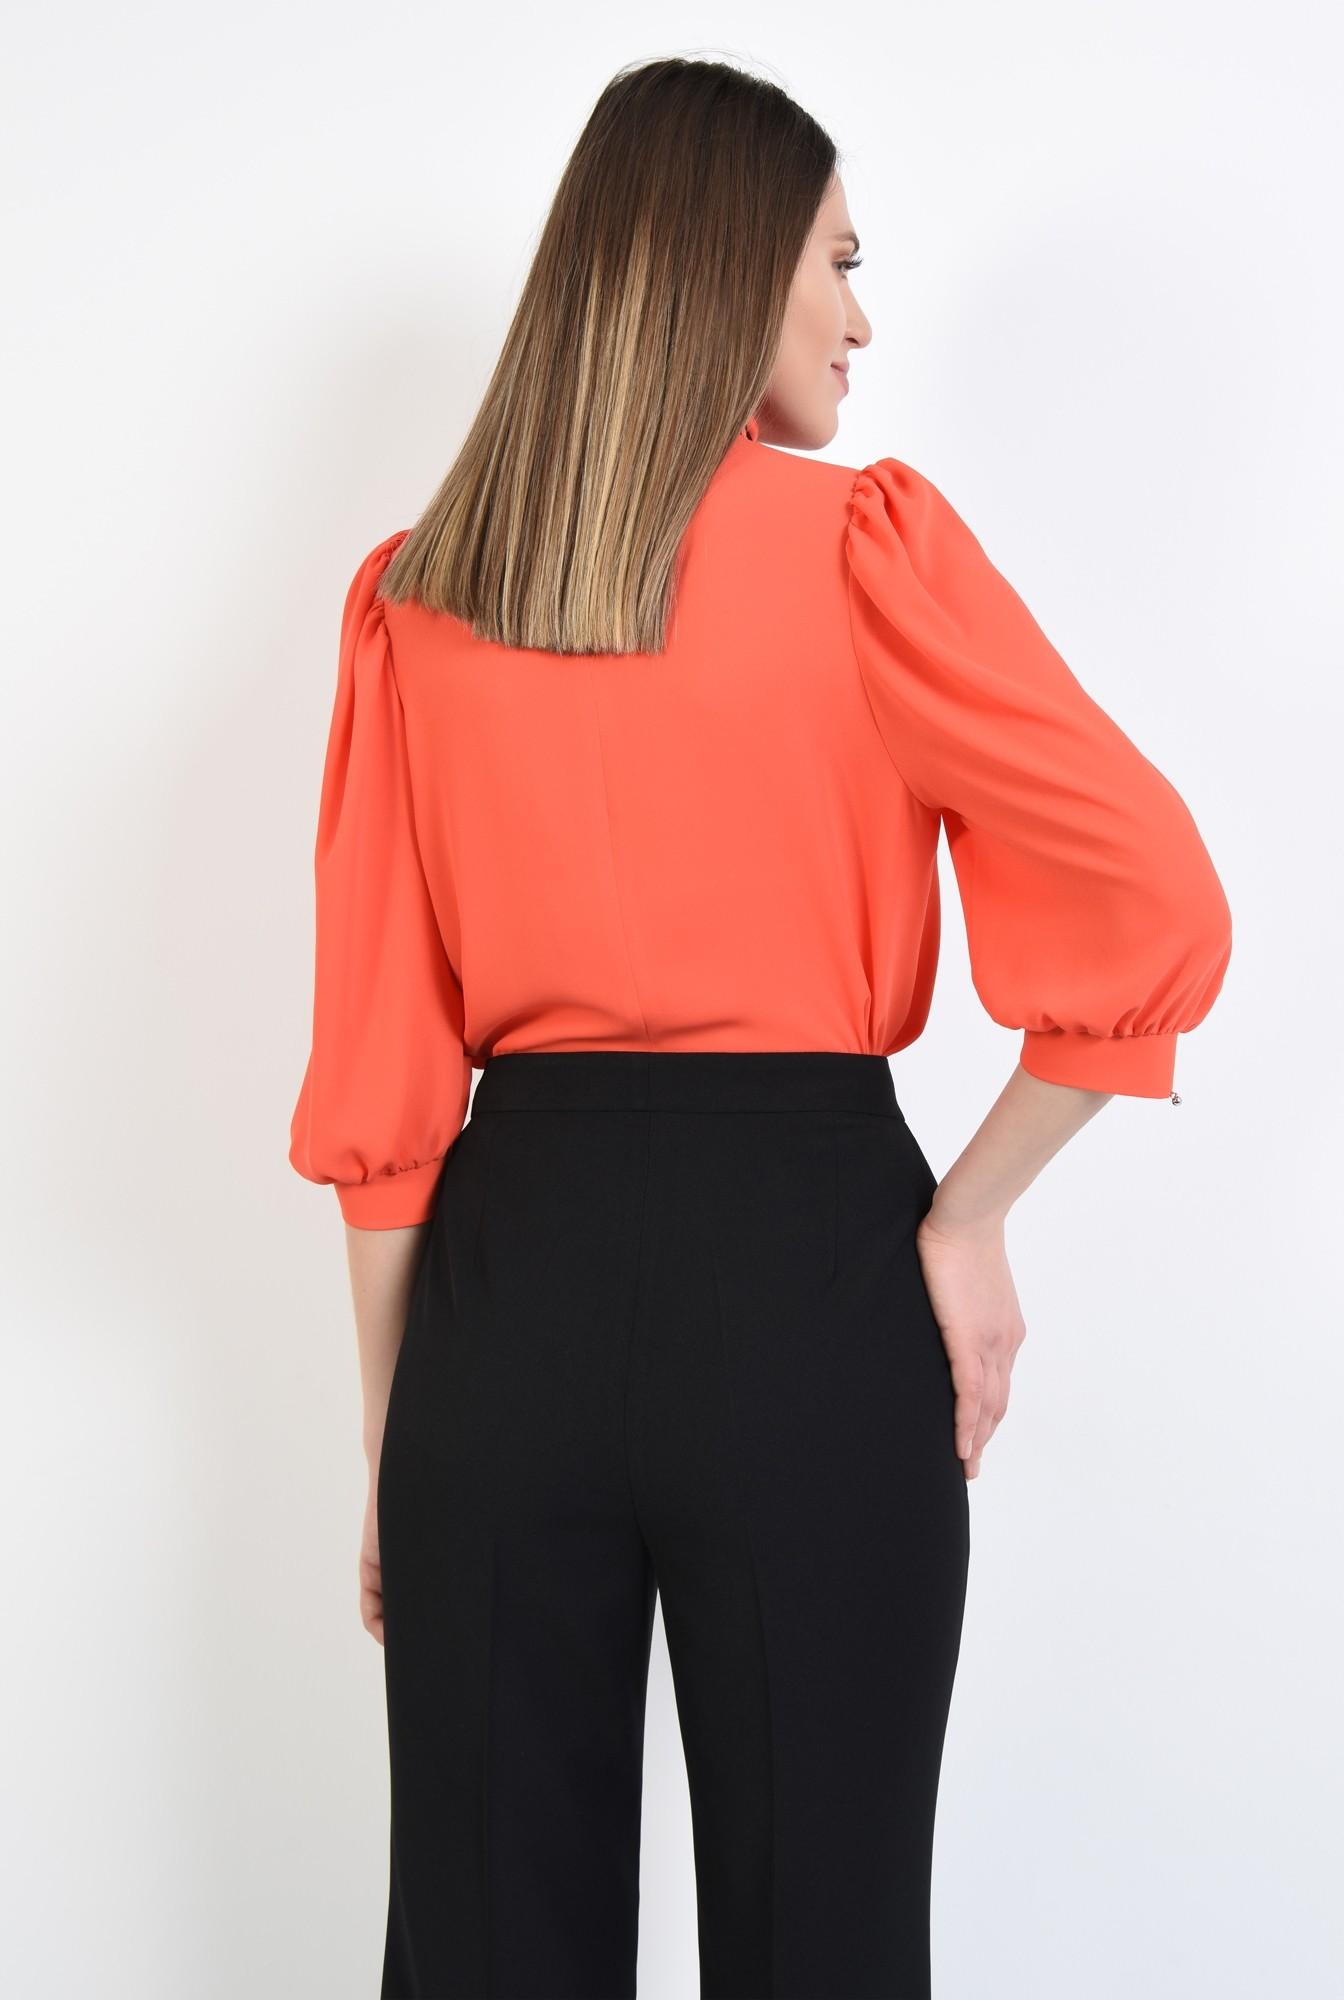 1 - 360 - bluza eleganta, maneci 3/4 cu mansete, funda neagra, bluza din sifon